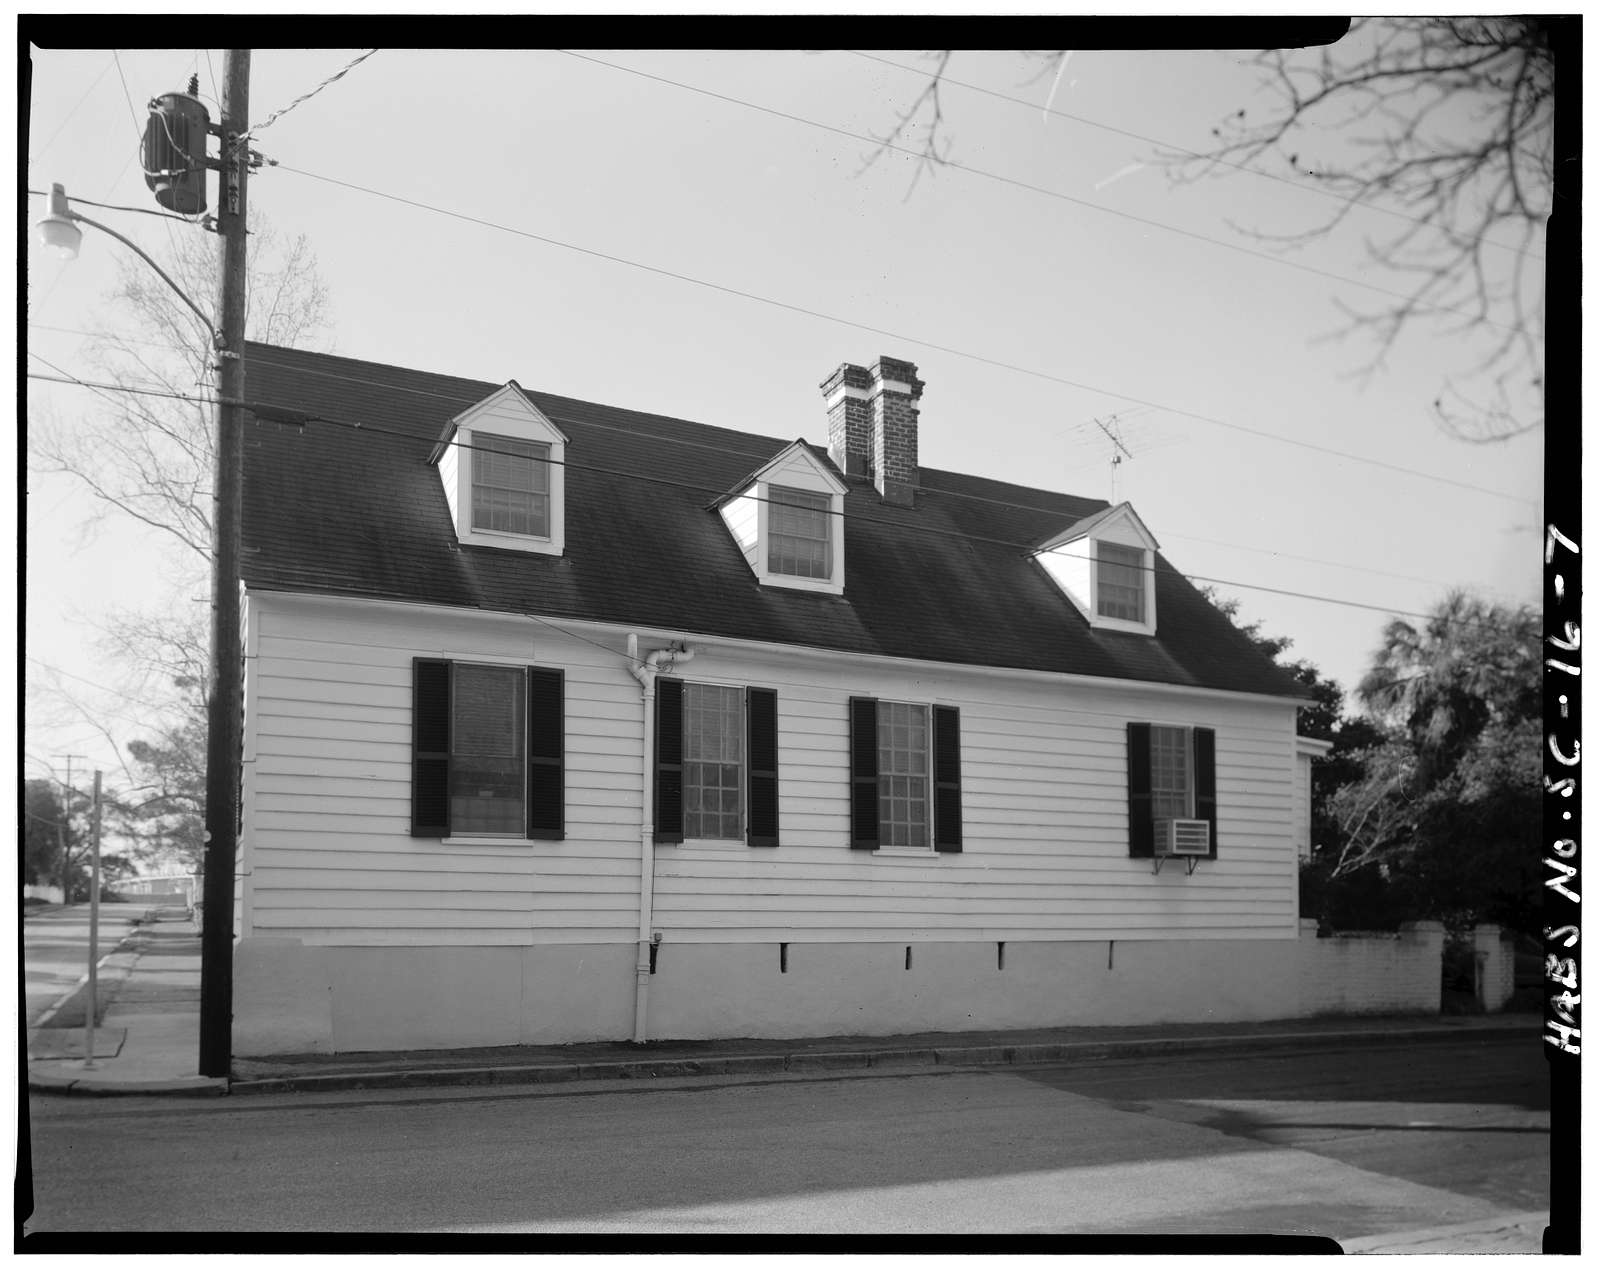 Thomas Hepworth House, 214 New Street, Beaufort, Beaufort County, SC